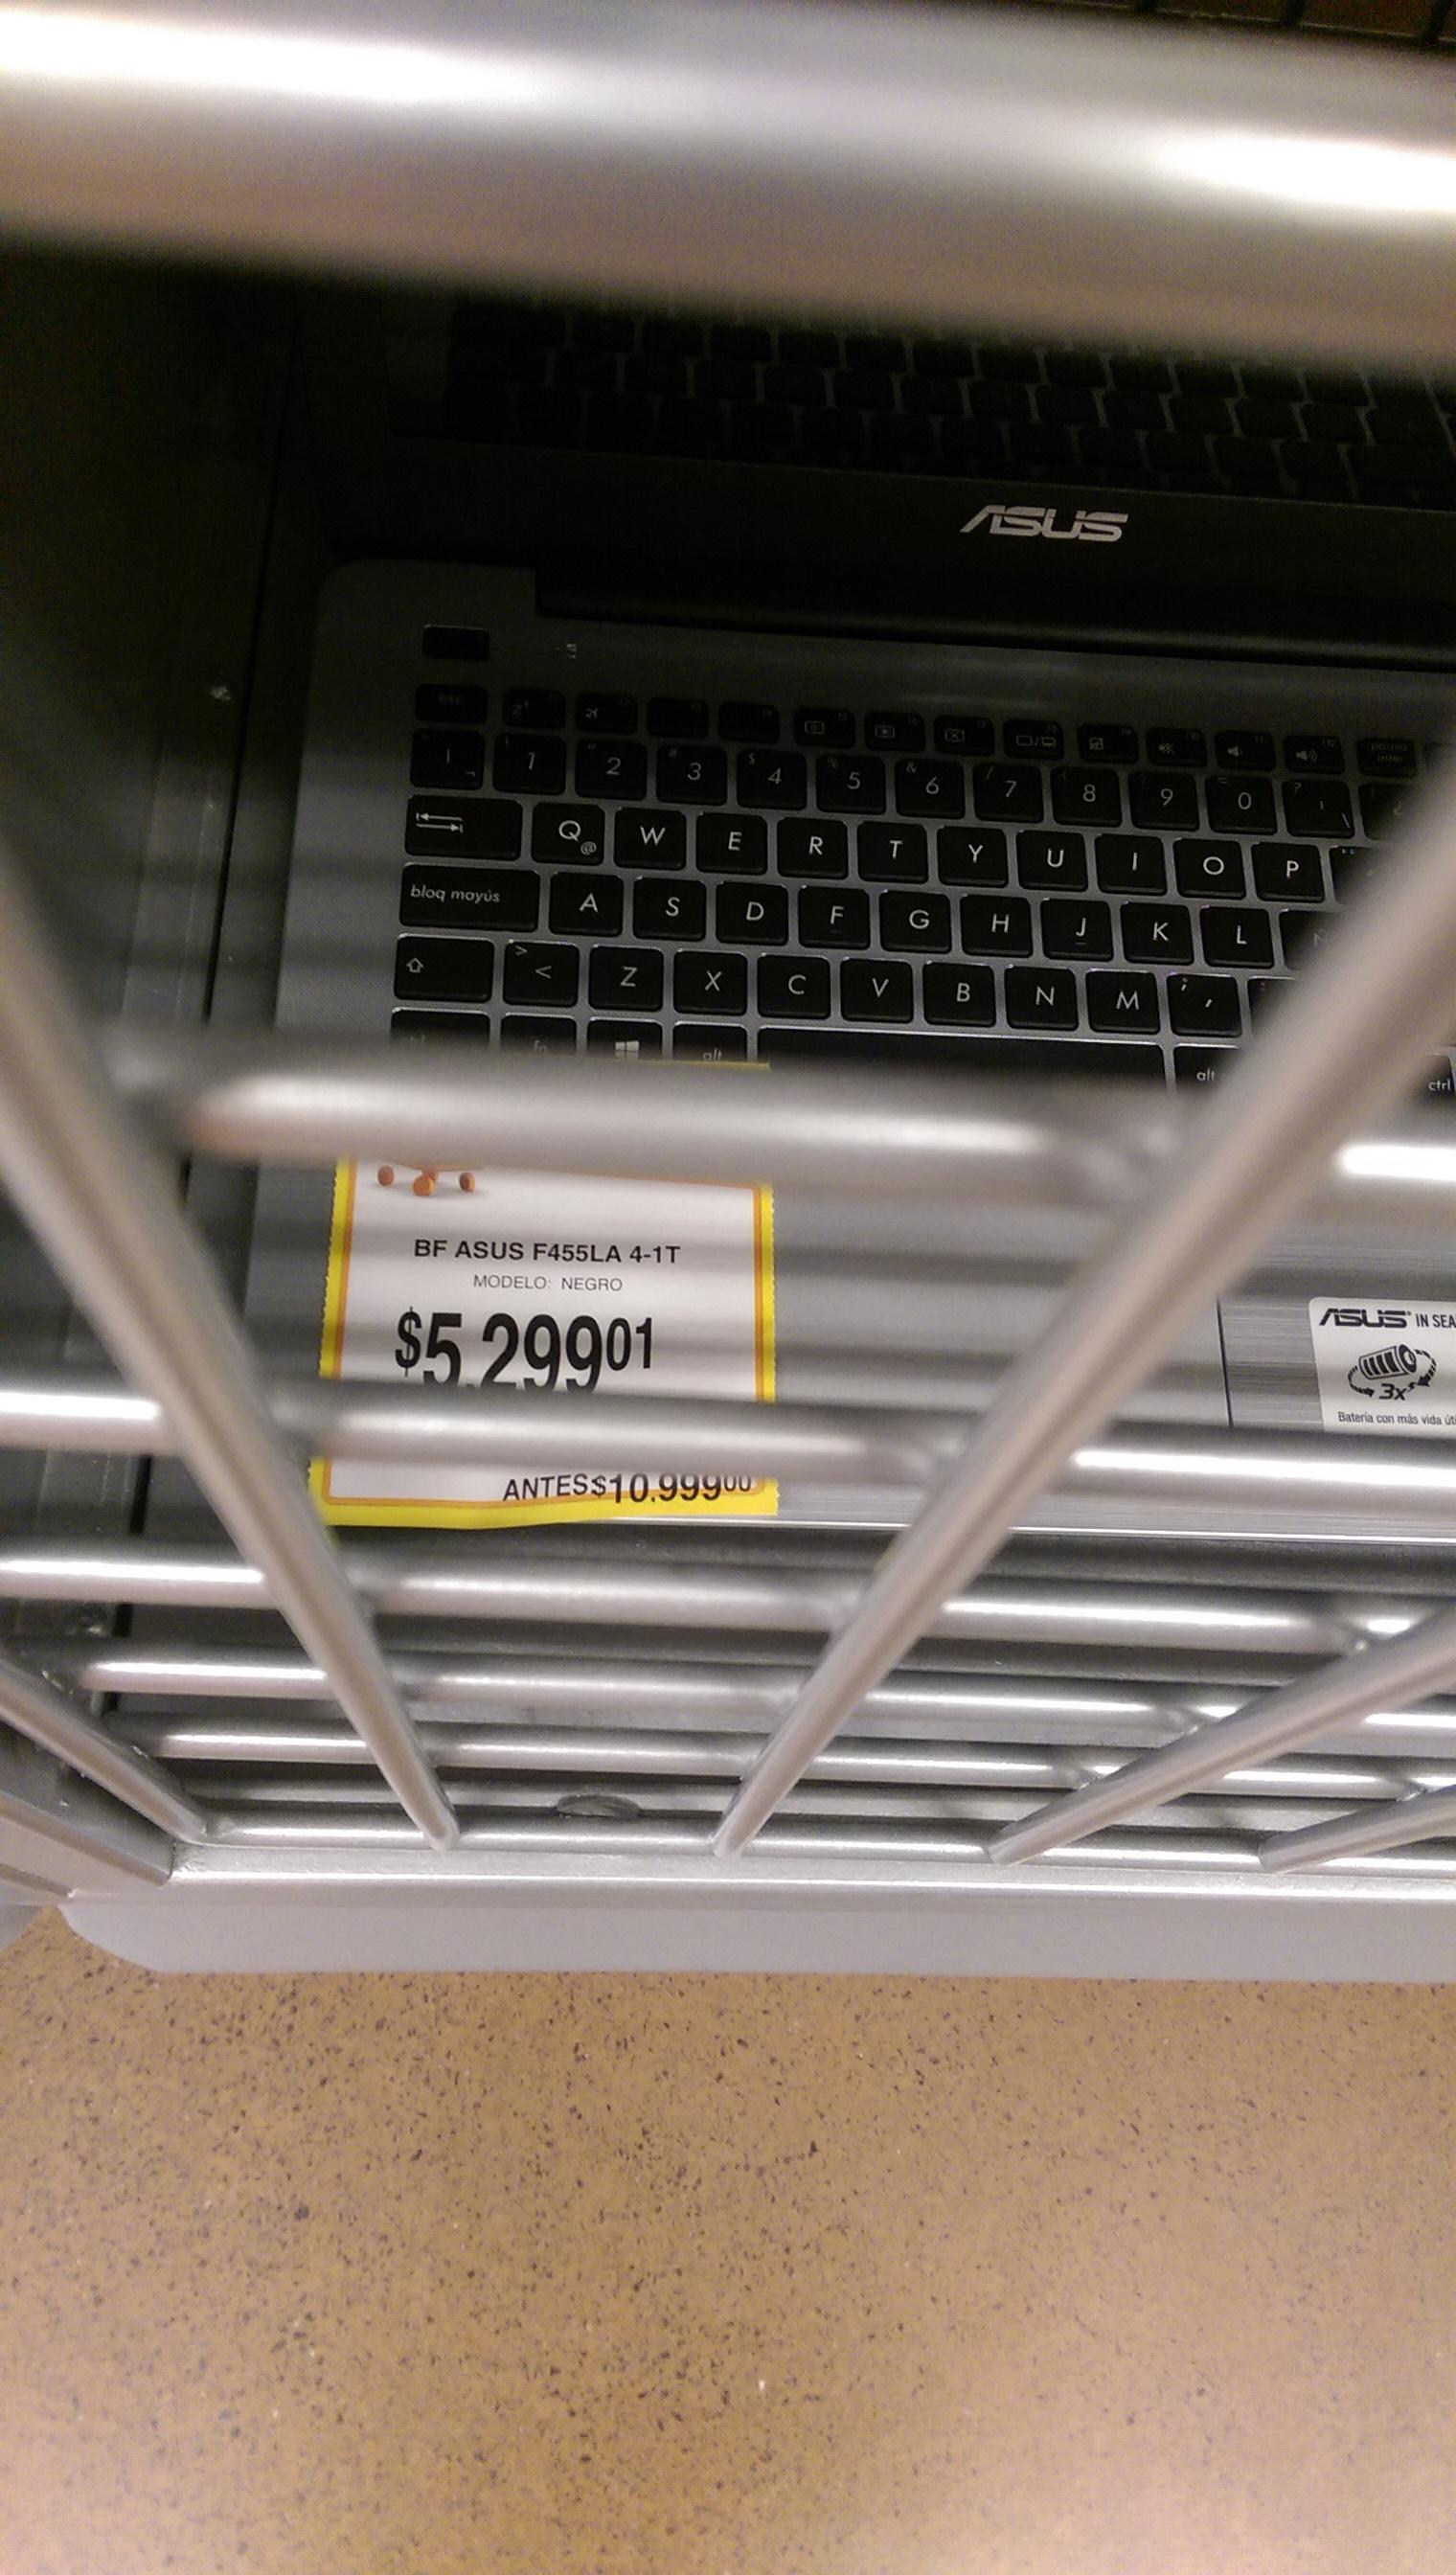 Walmart Palomar GDL: Lap Asus F455LA a $5,299.01